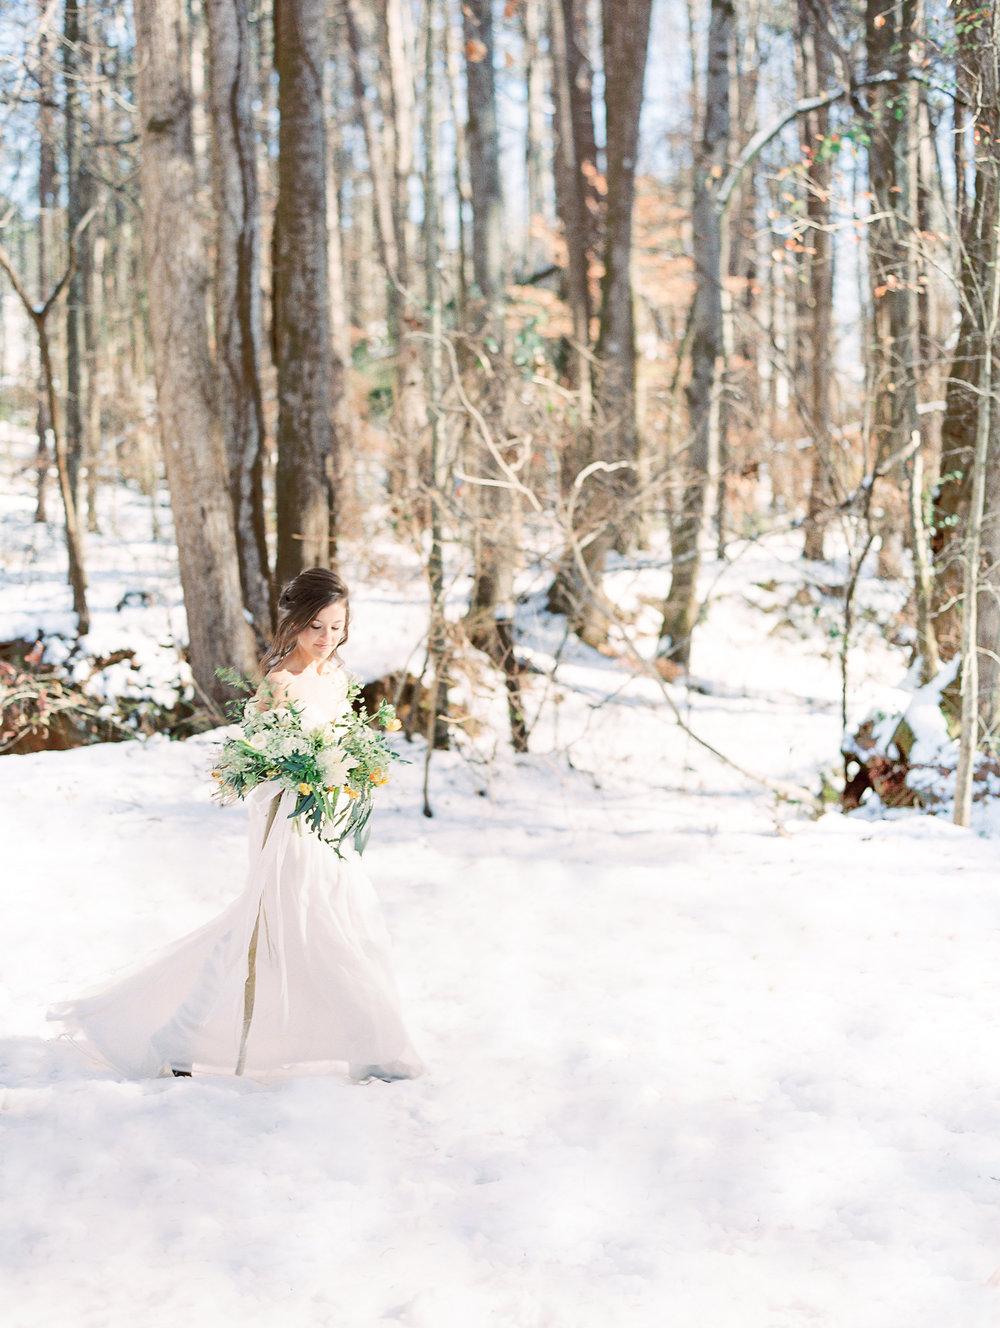 www.hannahforsberg.com-snow-day-14.jpg